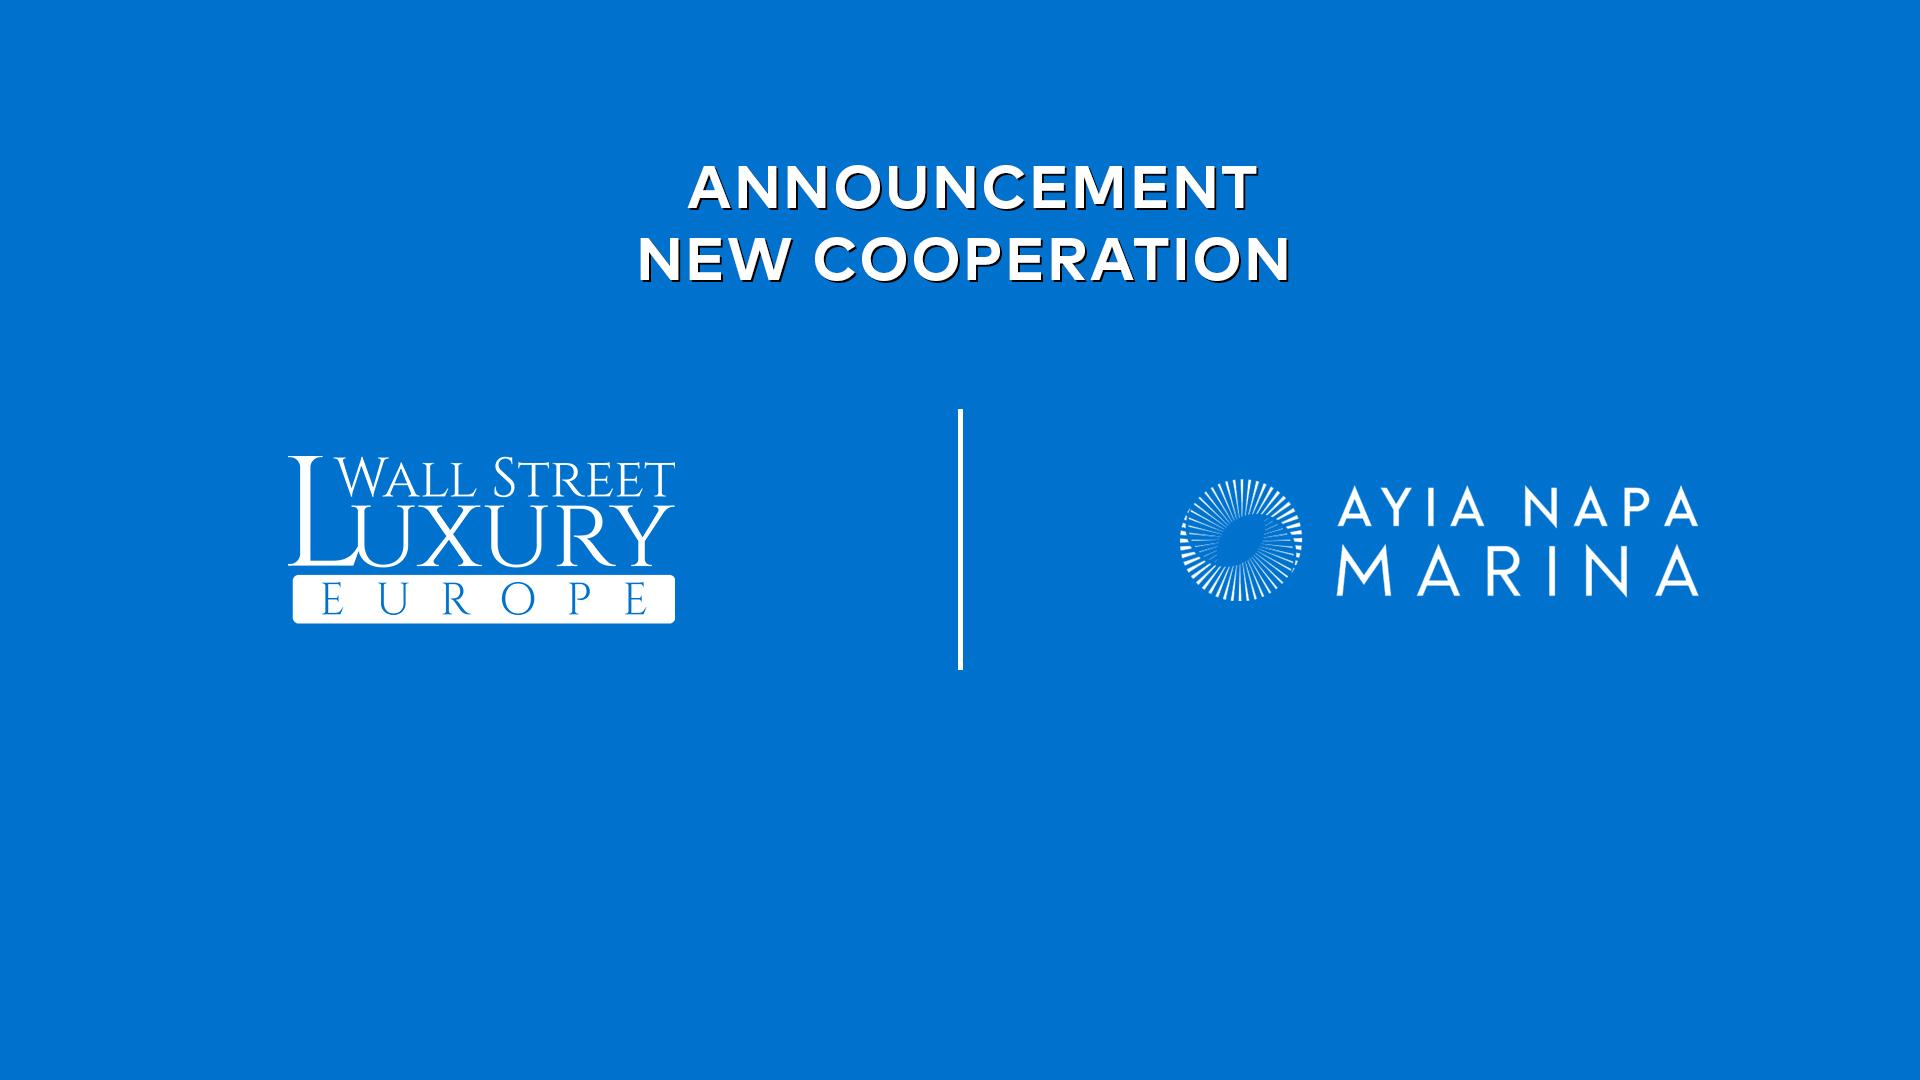 Ayia Napa Marina - Wall Street Luxury Europe